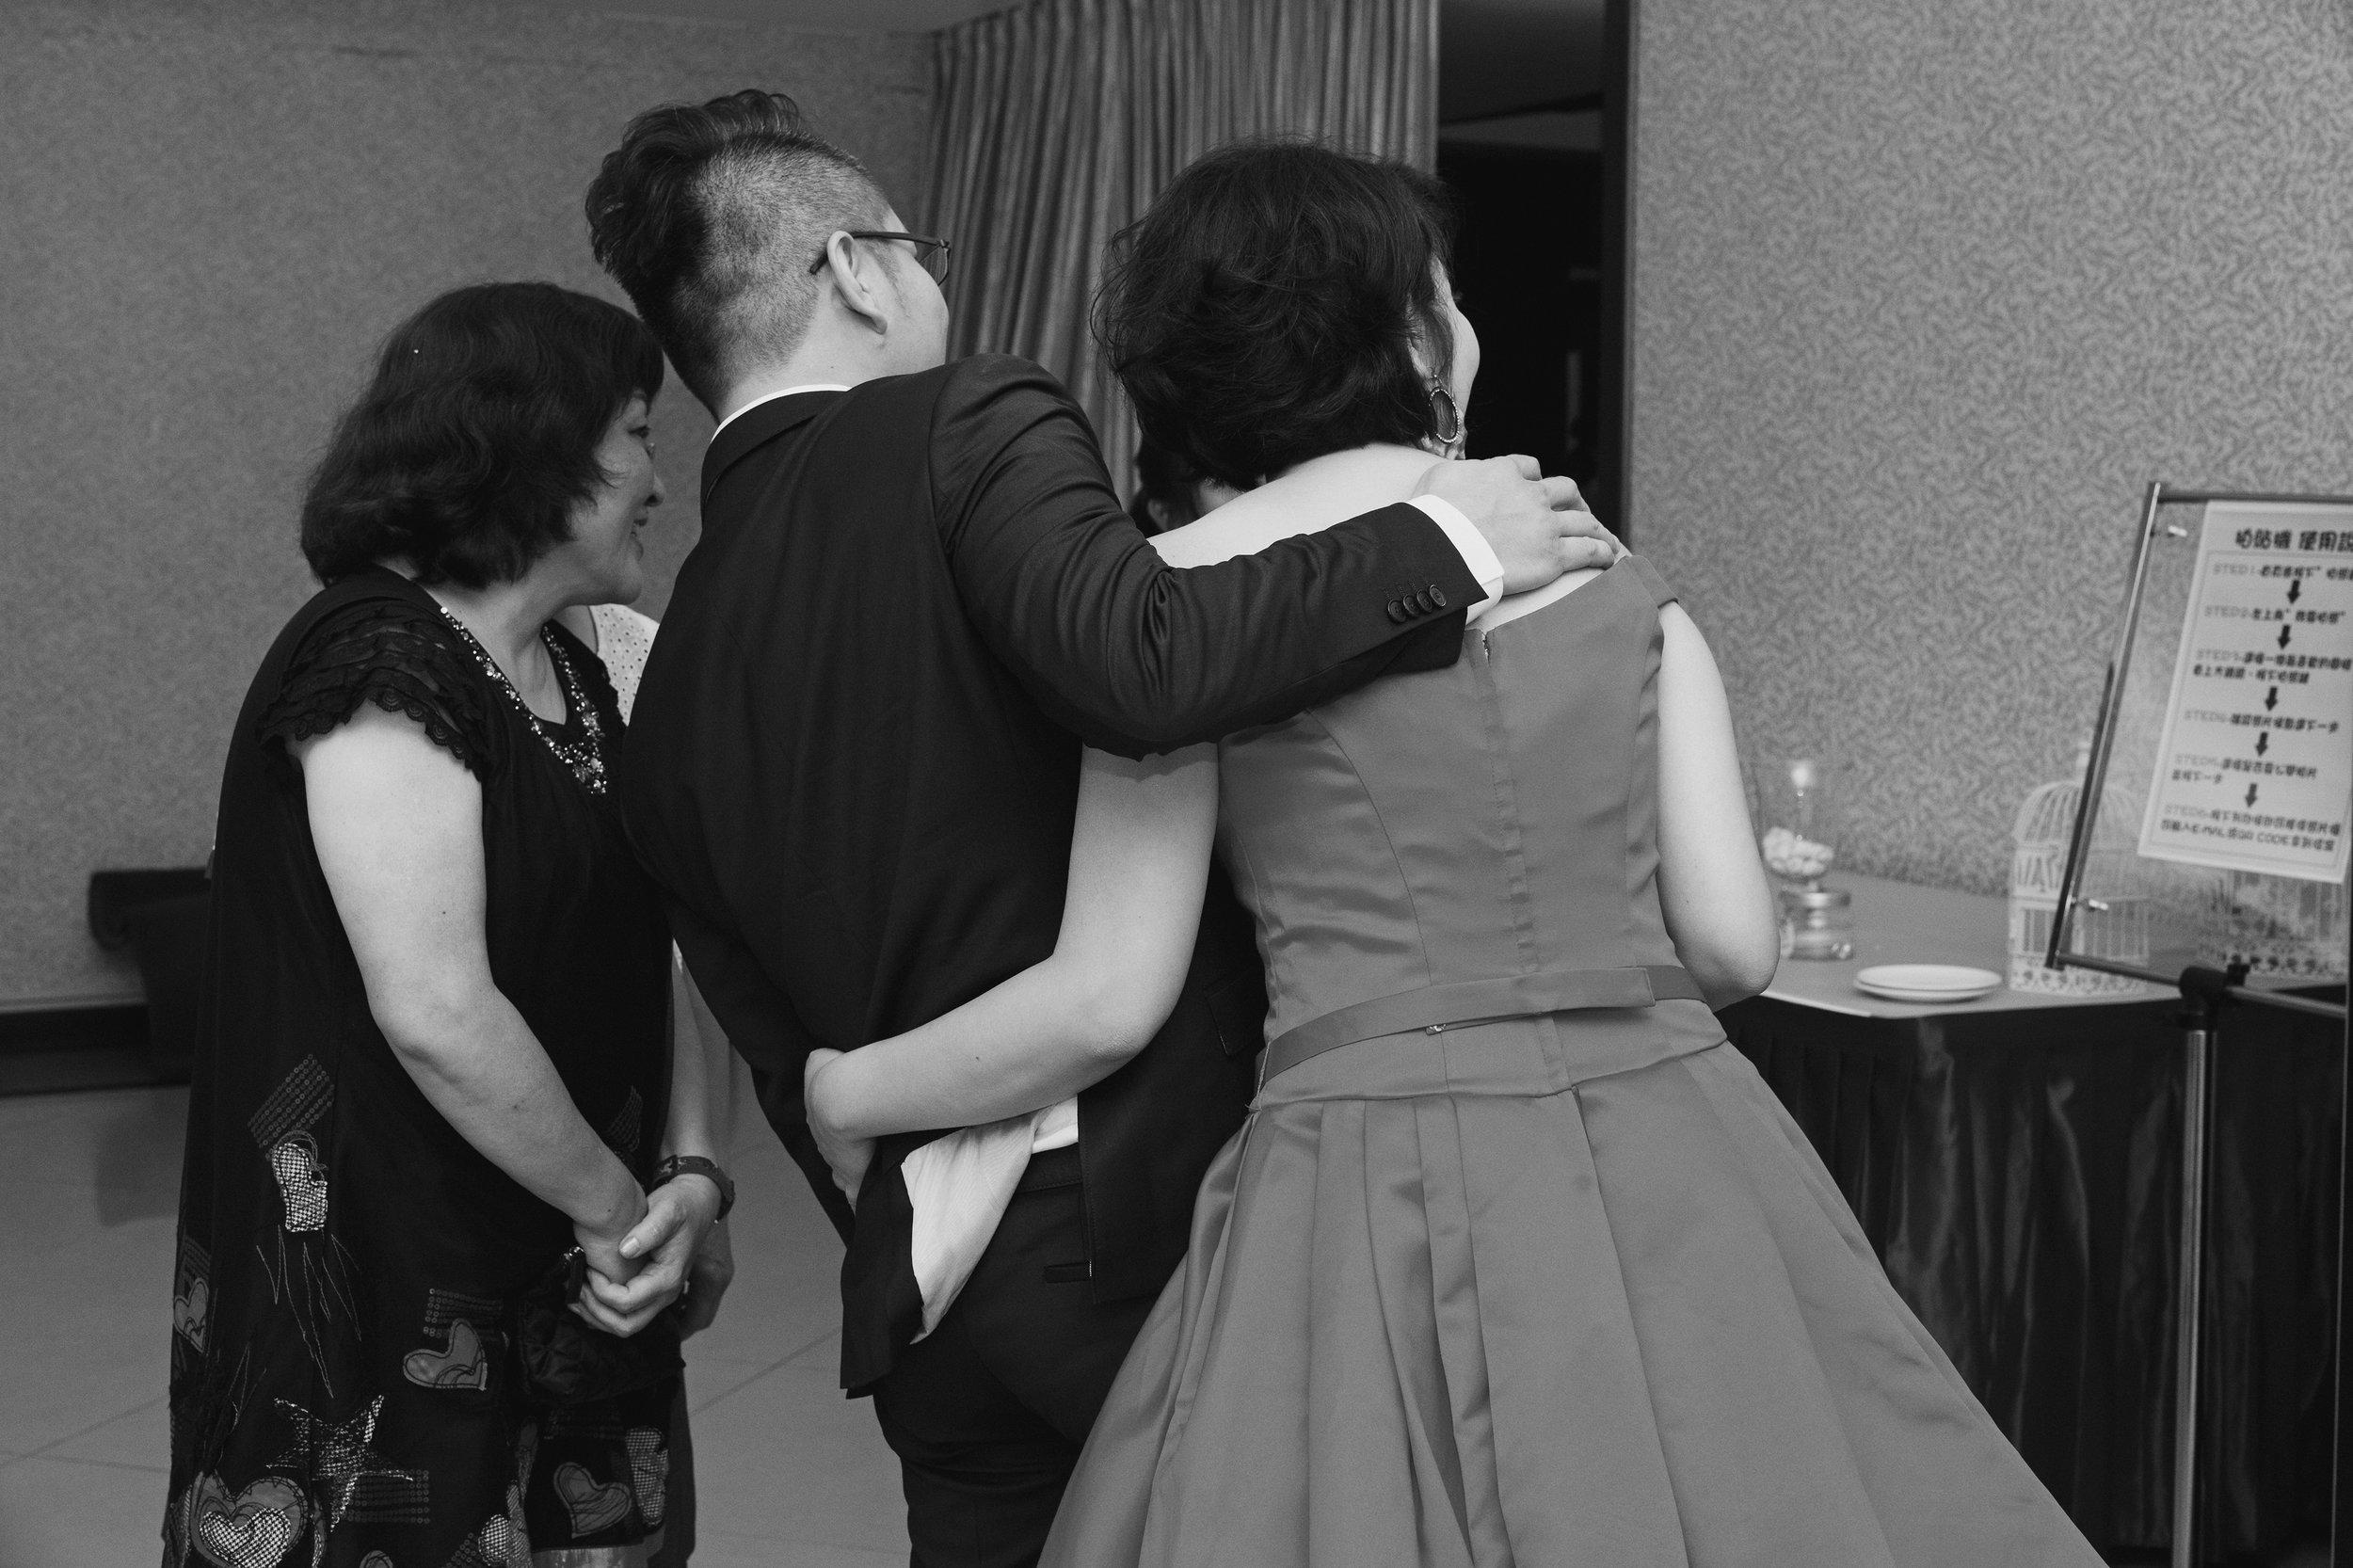 [JC]CREATIVE 女性攝影師 北投儷宴會館 補請台灣WEDDING    自然風格 台北婚攝推 女婚攝  桃園婚攝   圖像00378.JPG